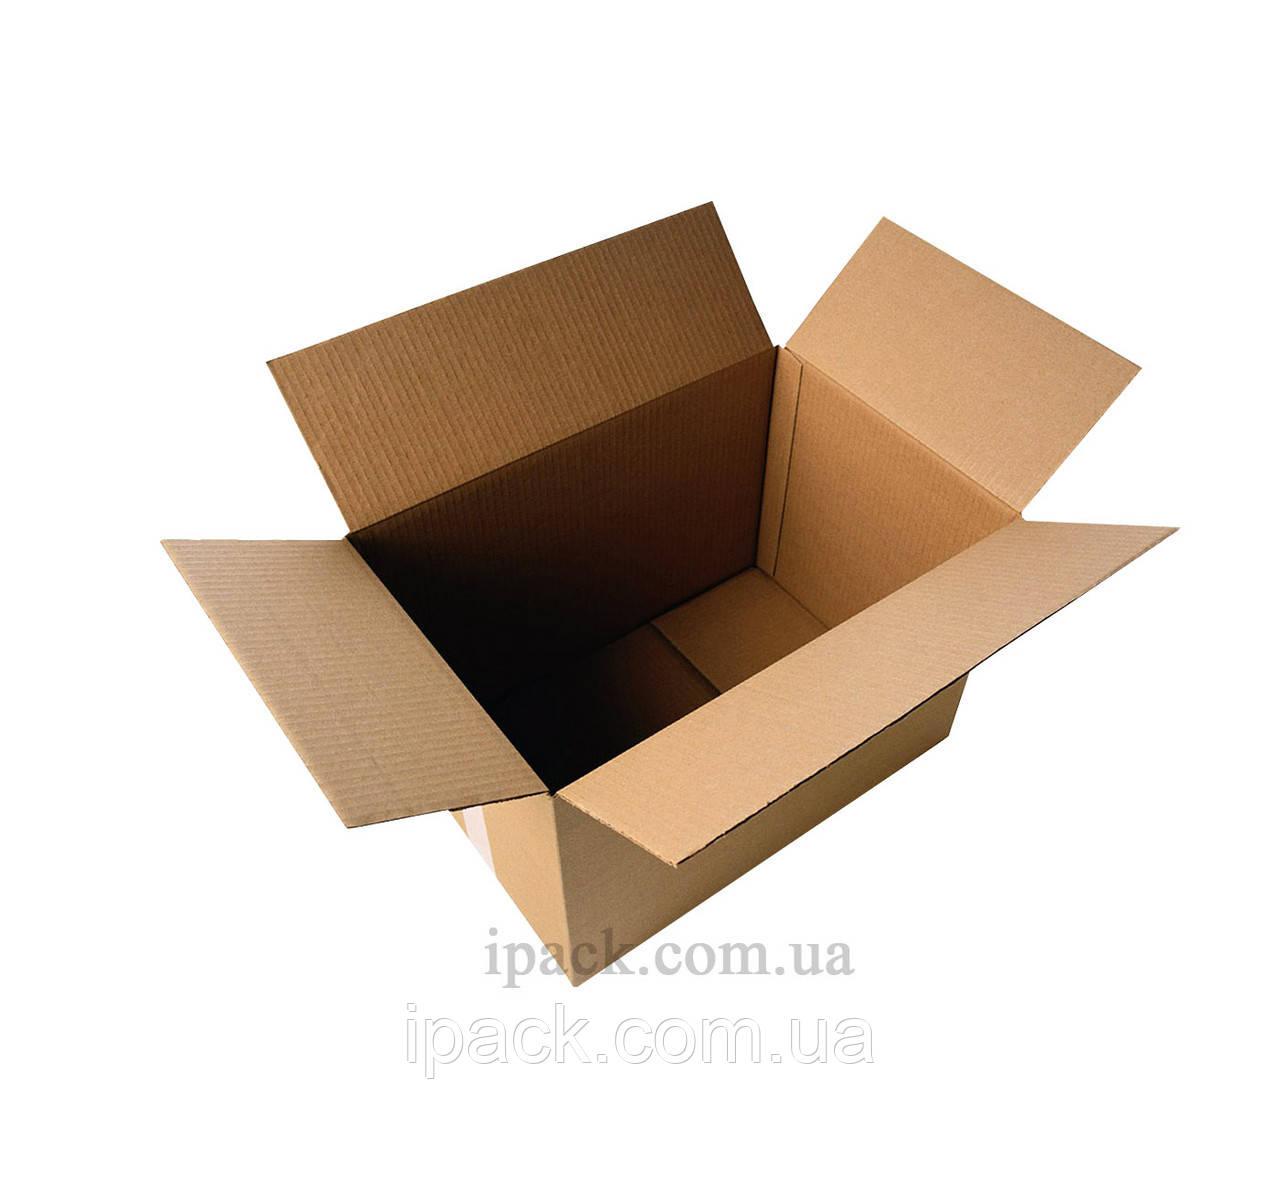 Гофроящик 140*100*160 мм, бурый, четырехклапанный картонный короб